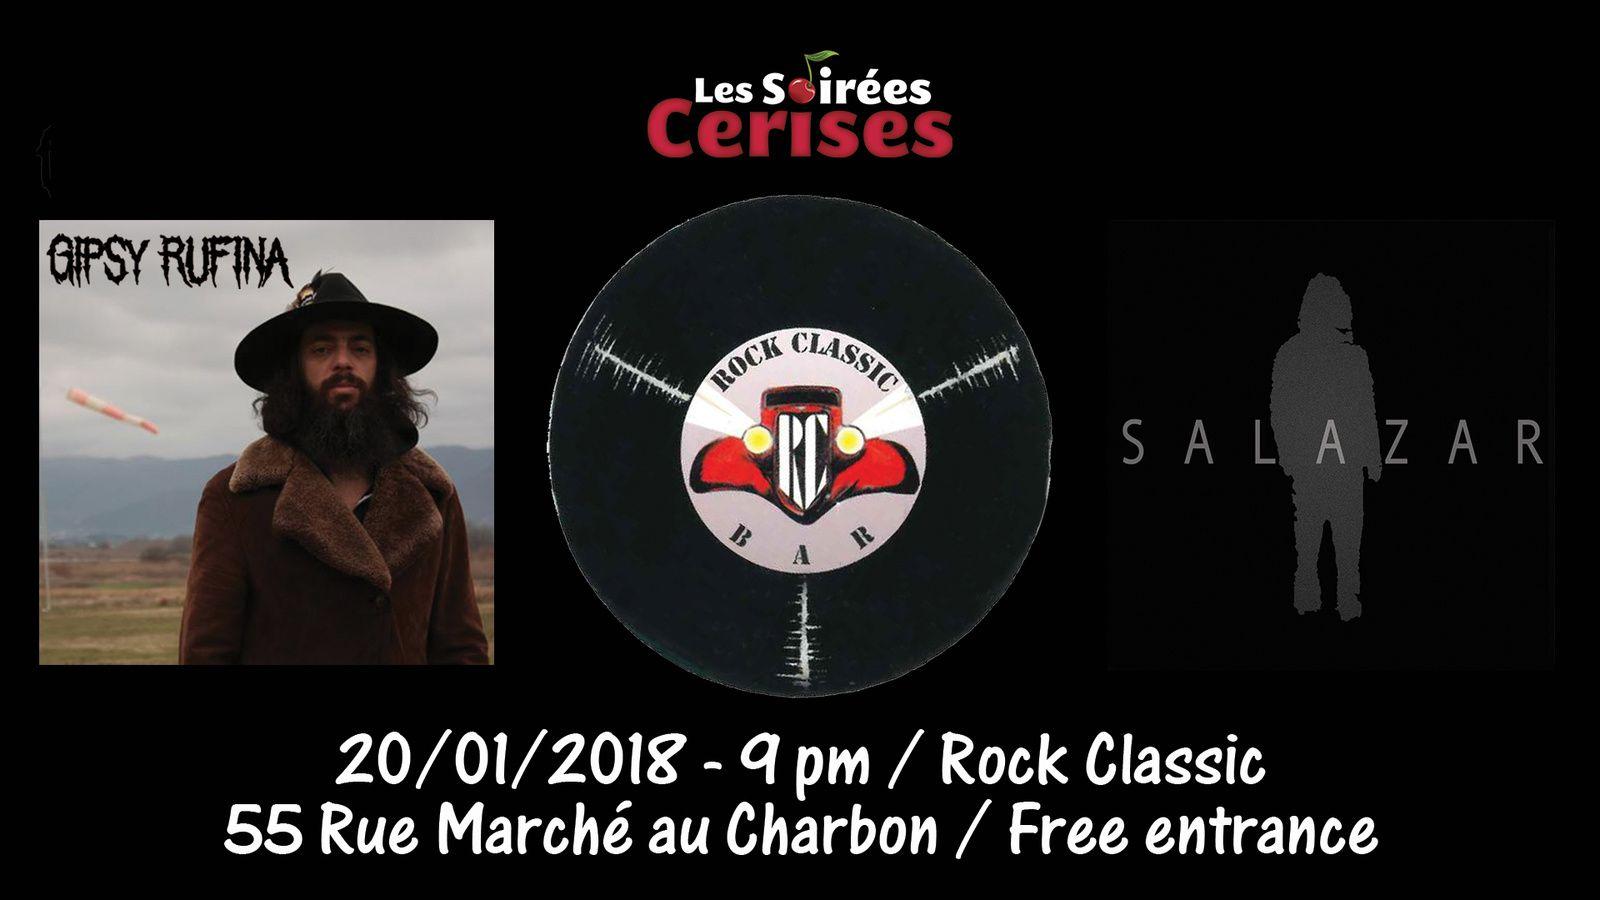 ▶ Salazar + Gipsy Rufina (It) @ Rock Classic - 20/01/2018 - 21h00 - Entrée gratuite !